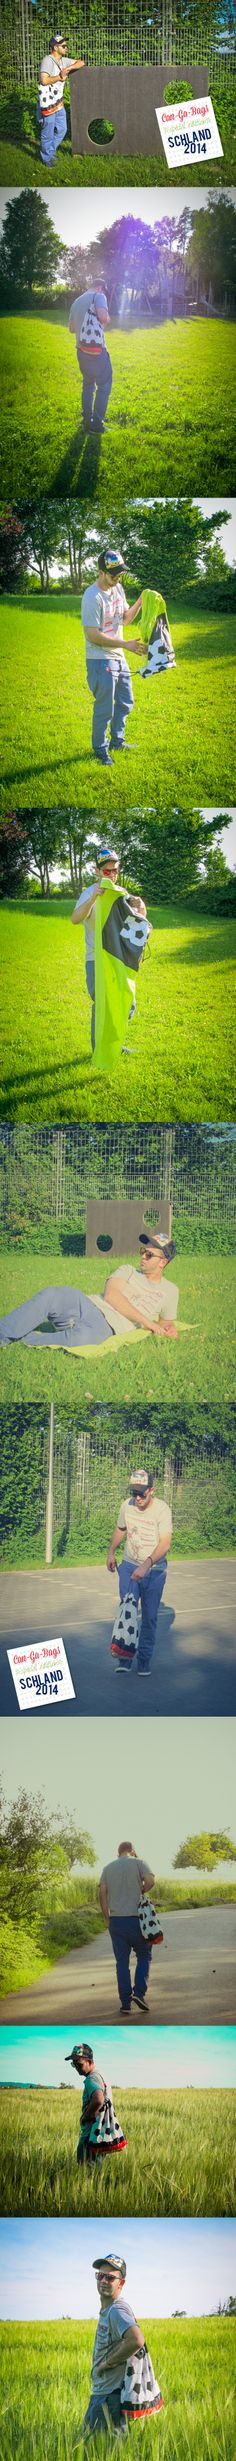 Look Book - Can-Ga-Bag: Schland 2014 *SPECIAL EDITION*